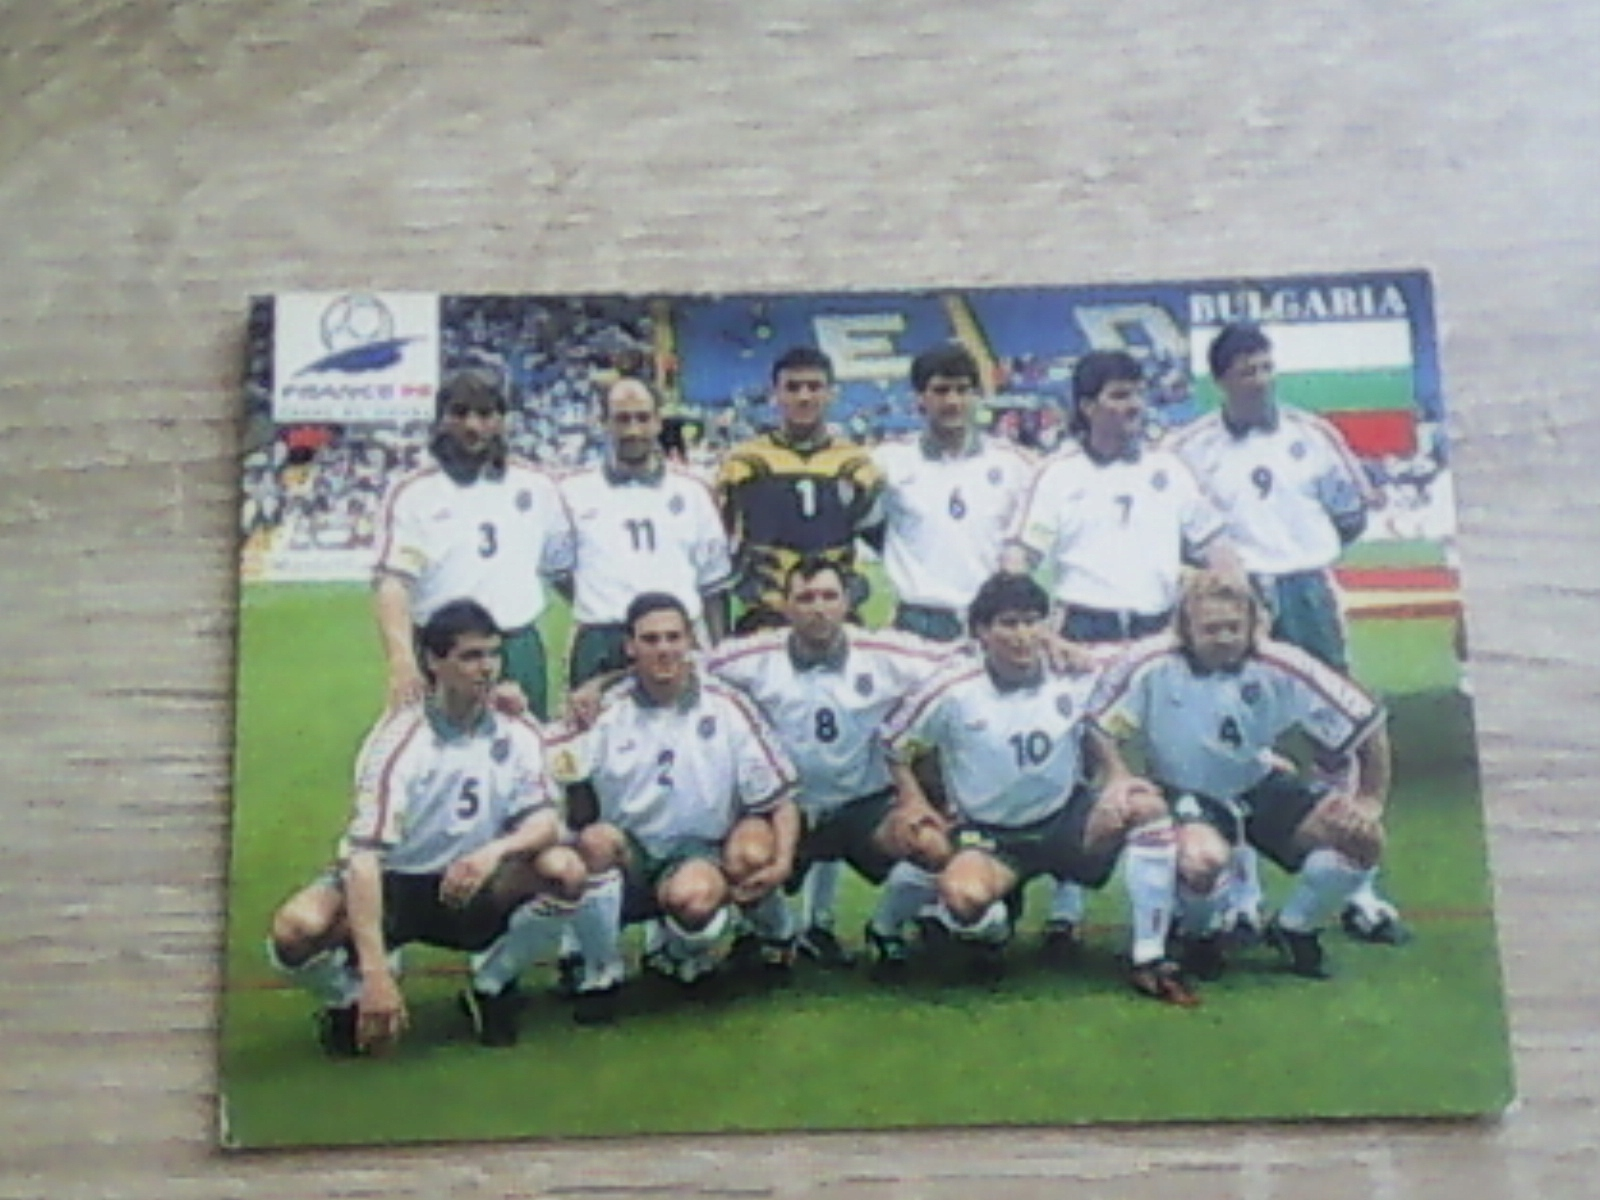 Piłka nożna - fotos zespołu Bułgaria